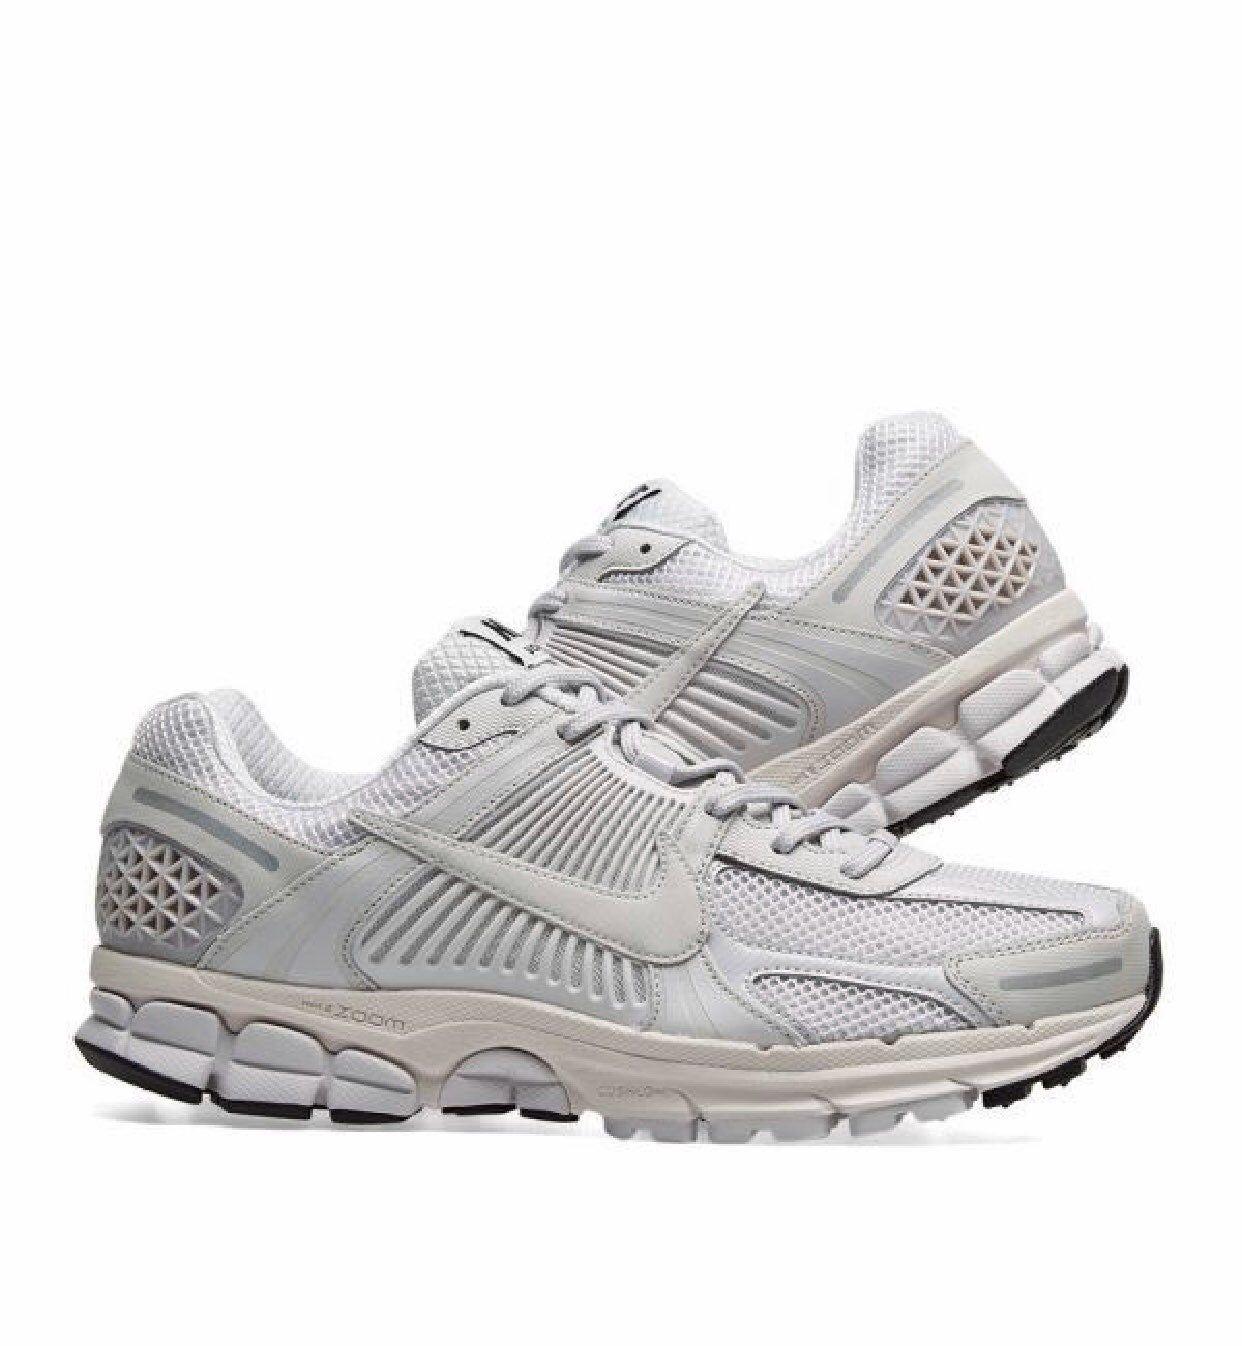 New Sz 10.5 Men's Nike Zoom Vomero 5 SP Running Vast Gray